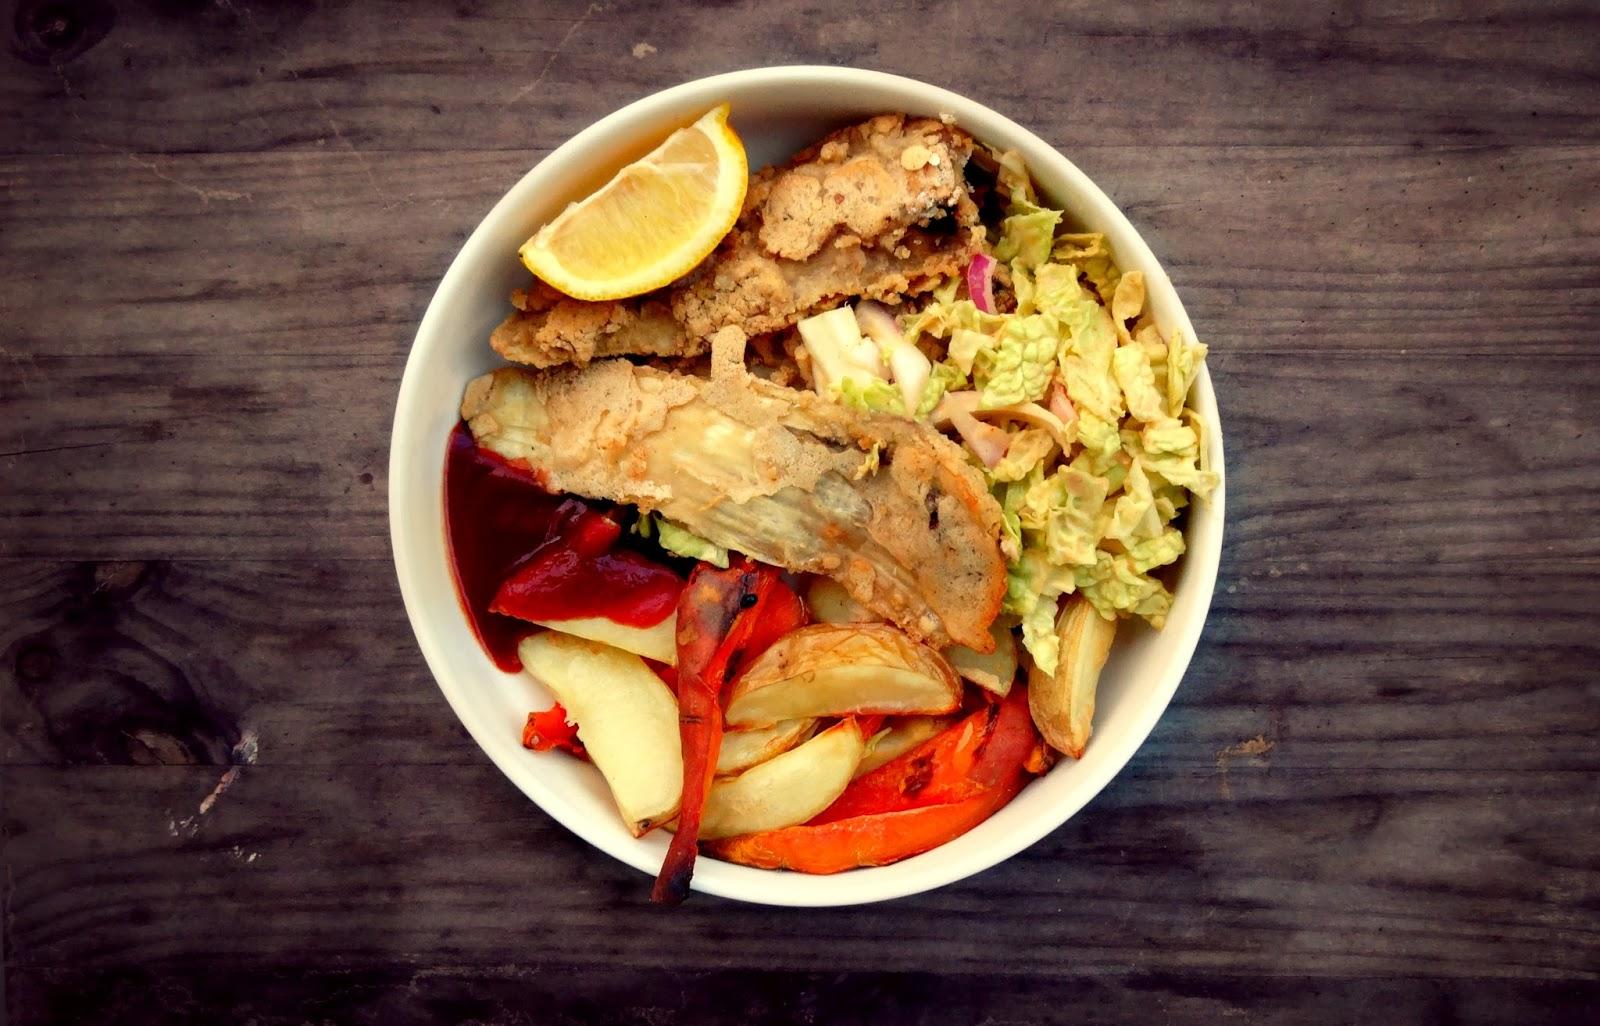 Baked fish n chips vegan gf soy free baking backwards for Vegan fish sauce substitute